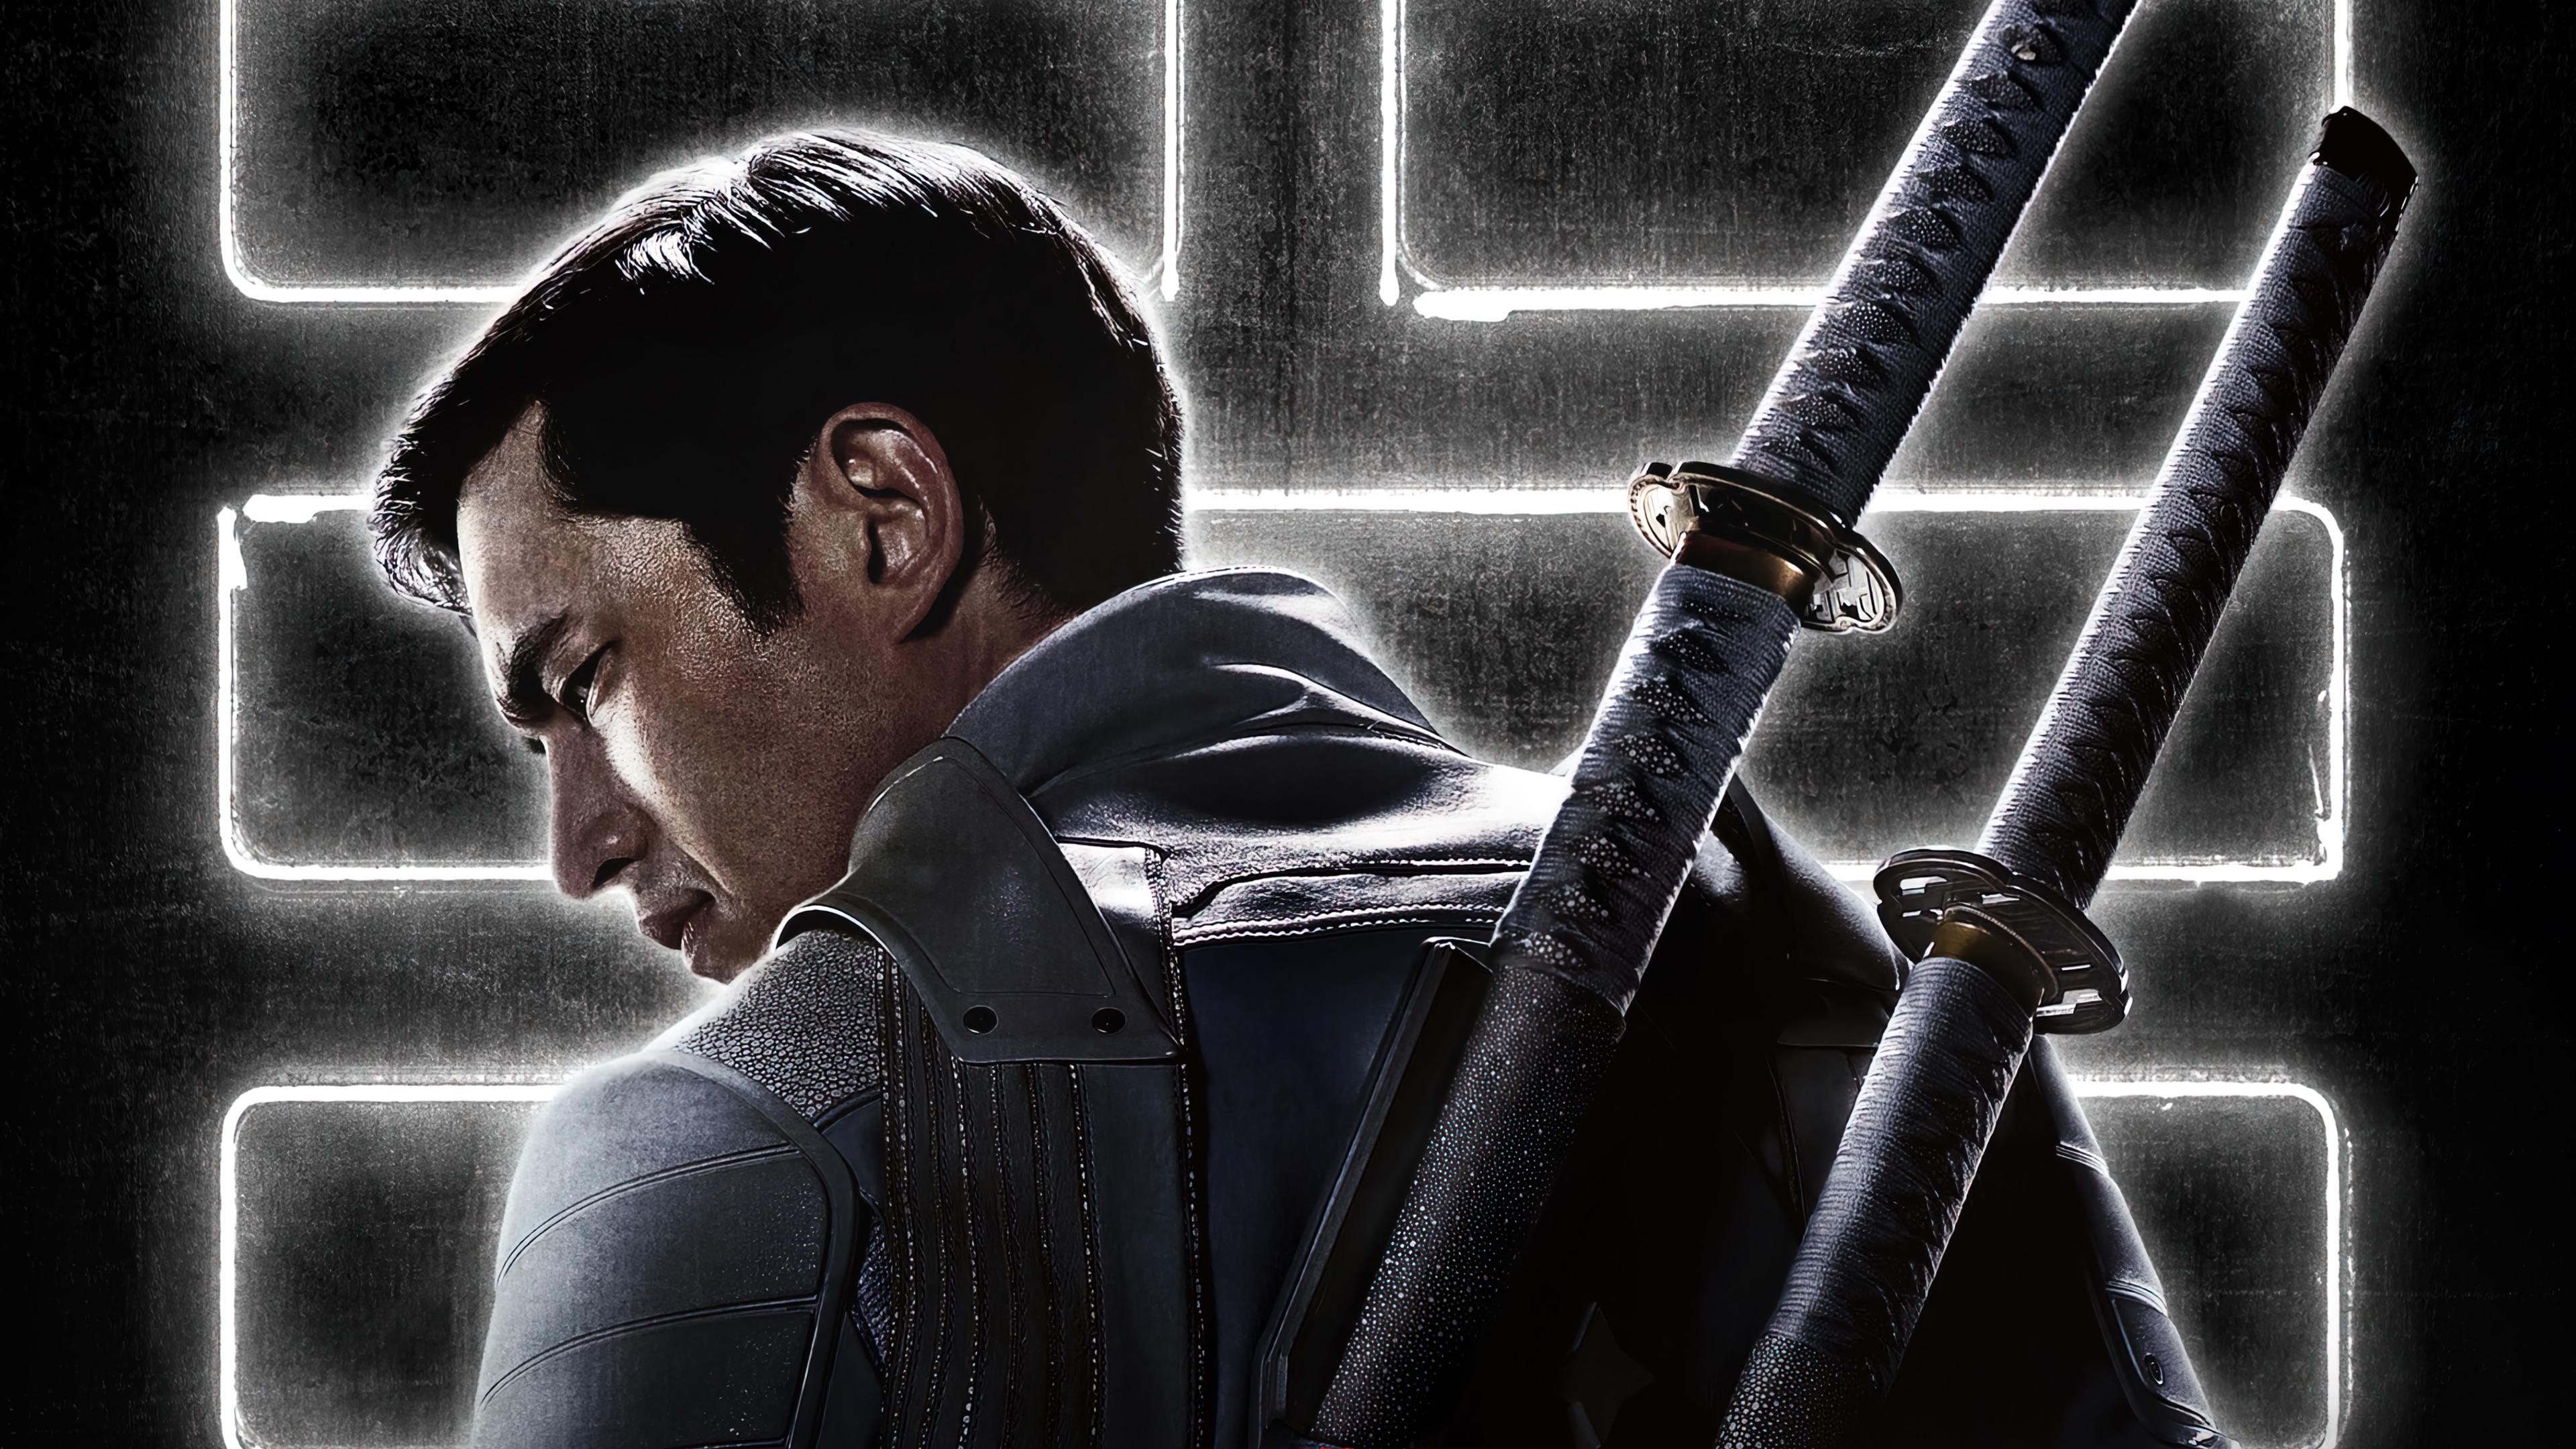 Wallpaper Andrew Koji in Snake Eyes Movie